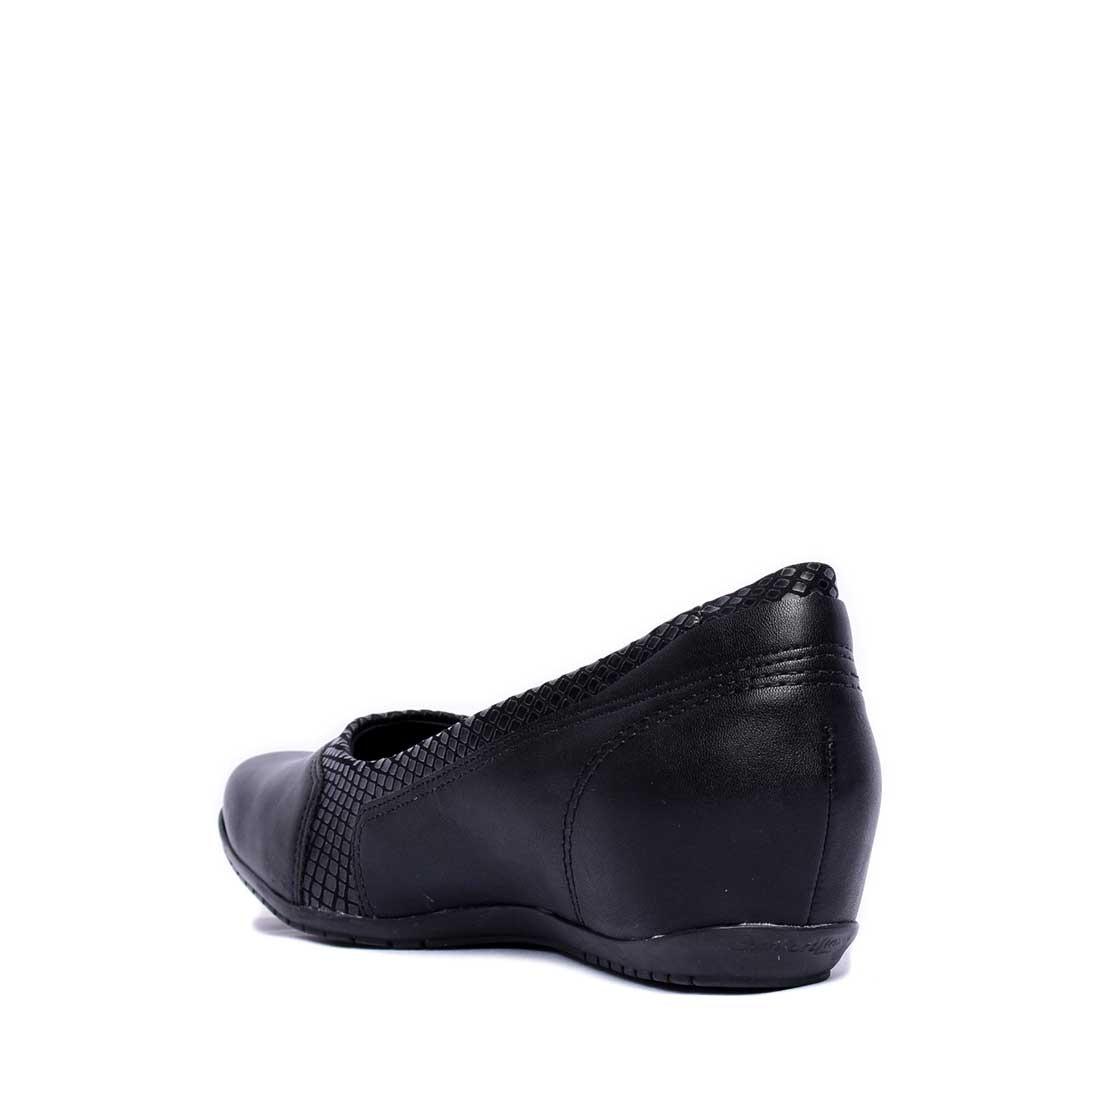 0fb8adc3d Sapato Feminino Casual Comfortflex Flats Ultrasoft - R$ 145,90 em ...